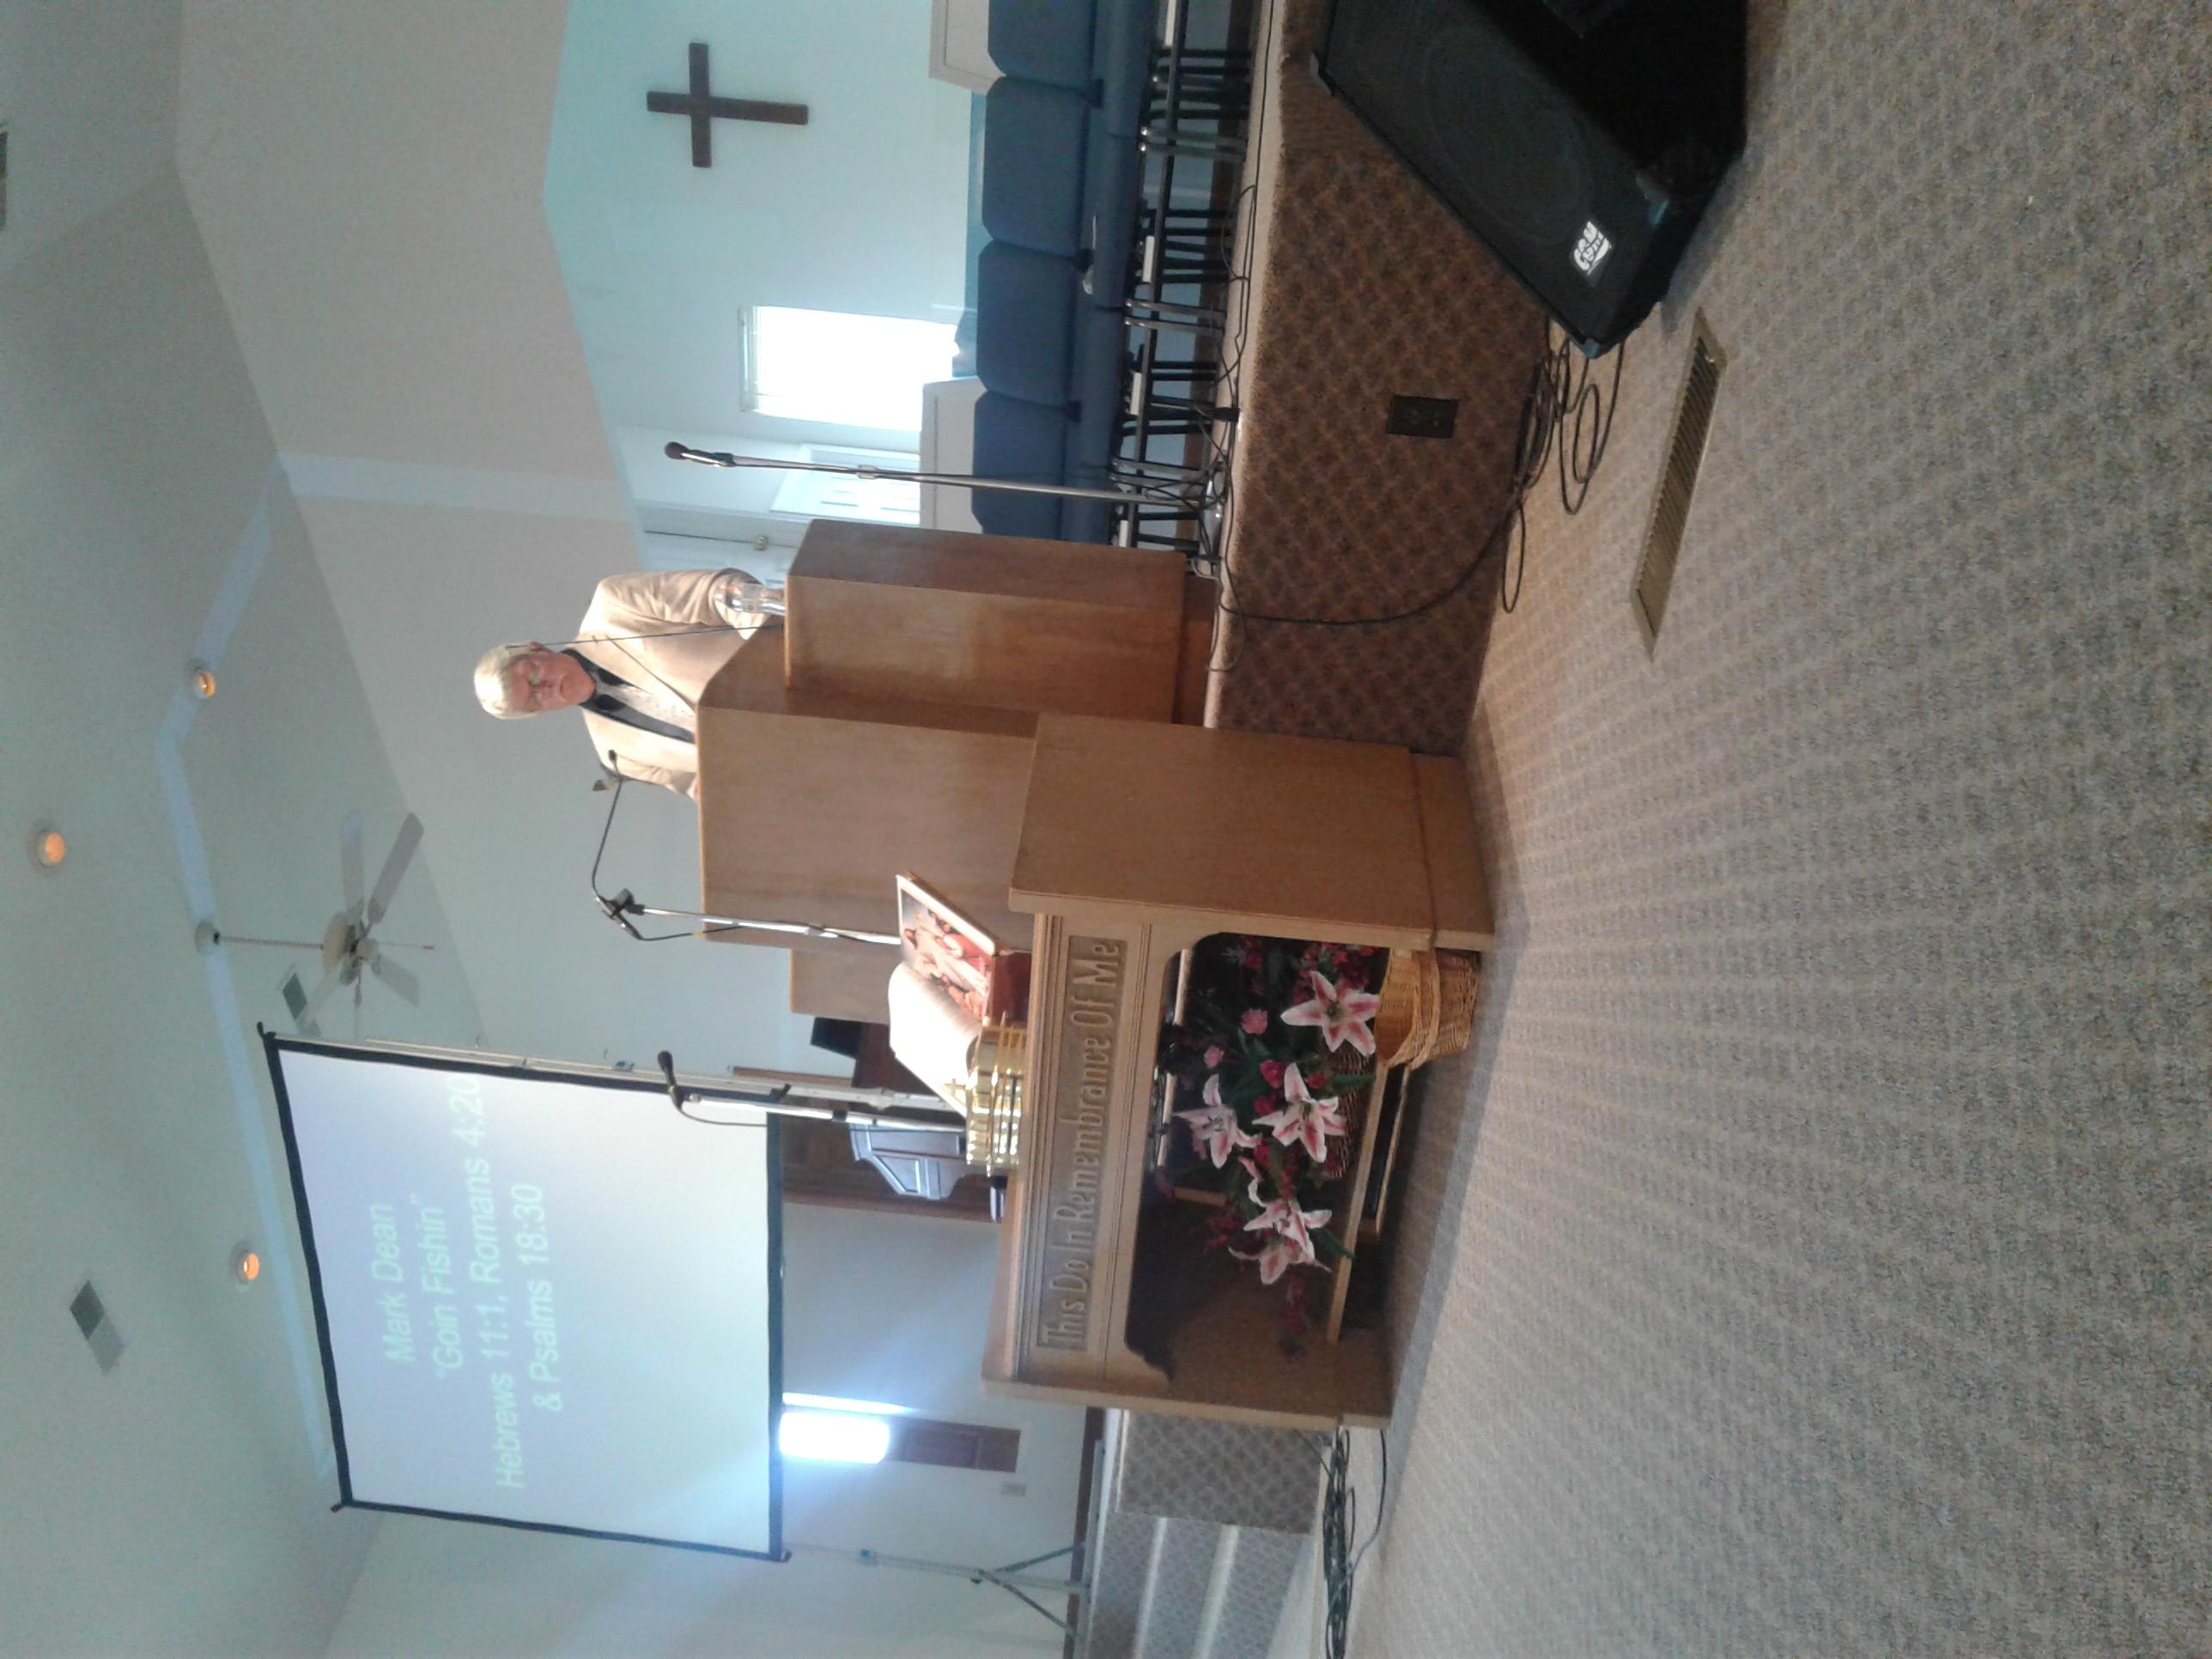 Mark preaching goose creek 1